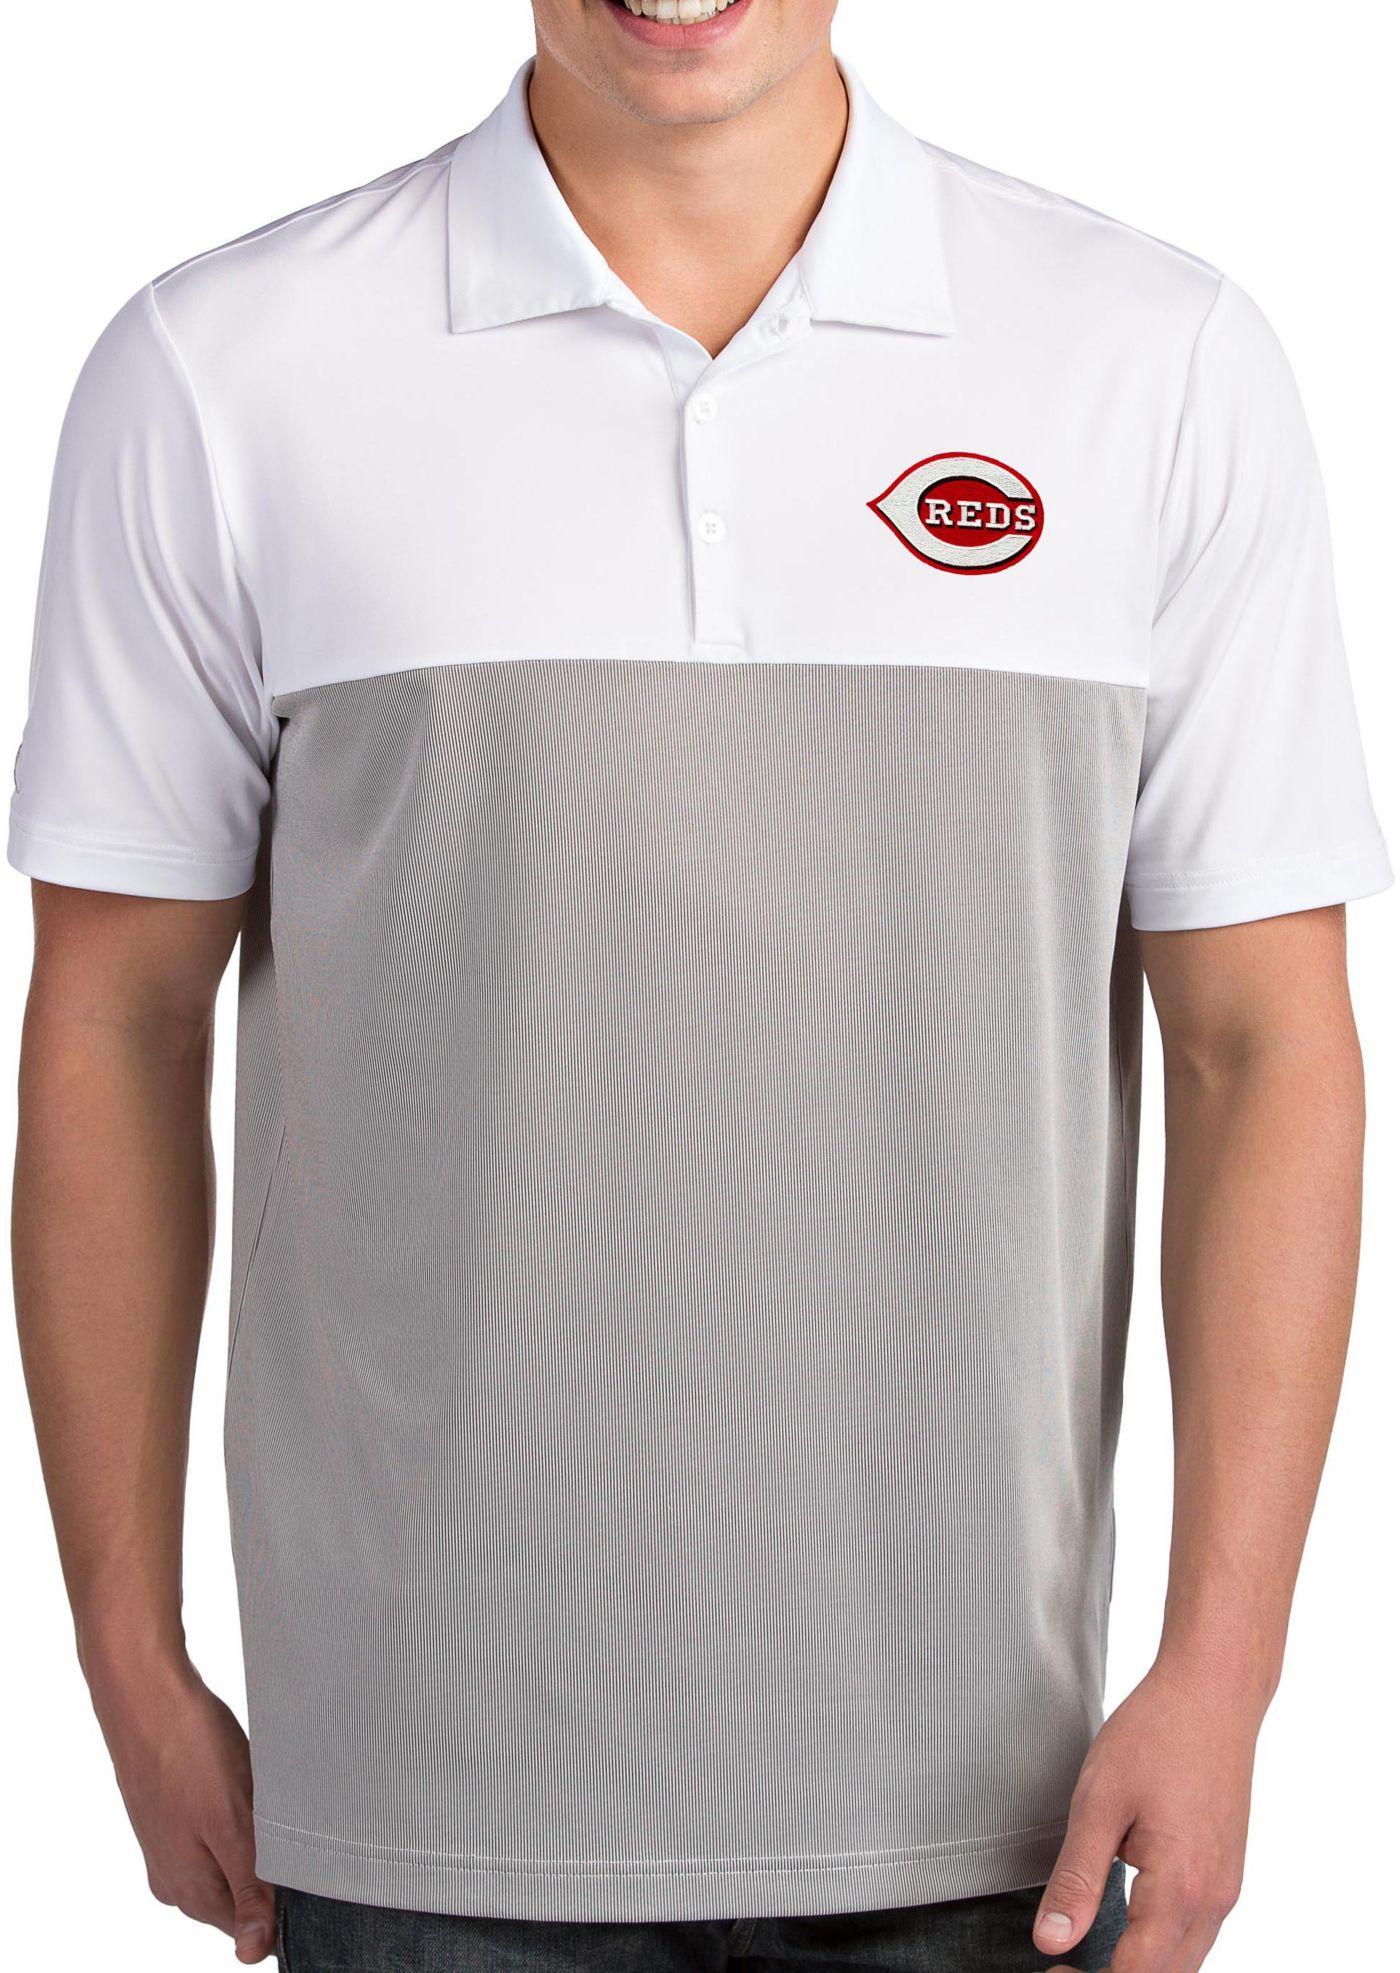 Antigua Men's Cincinnati Reds Venture White Performance Polo